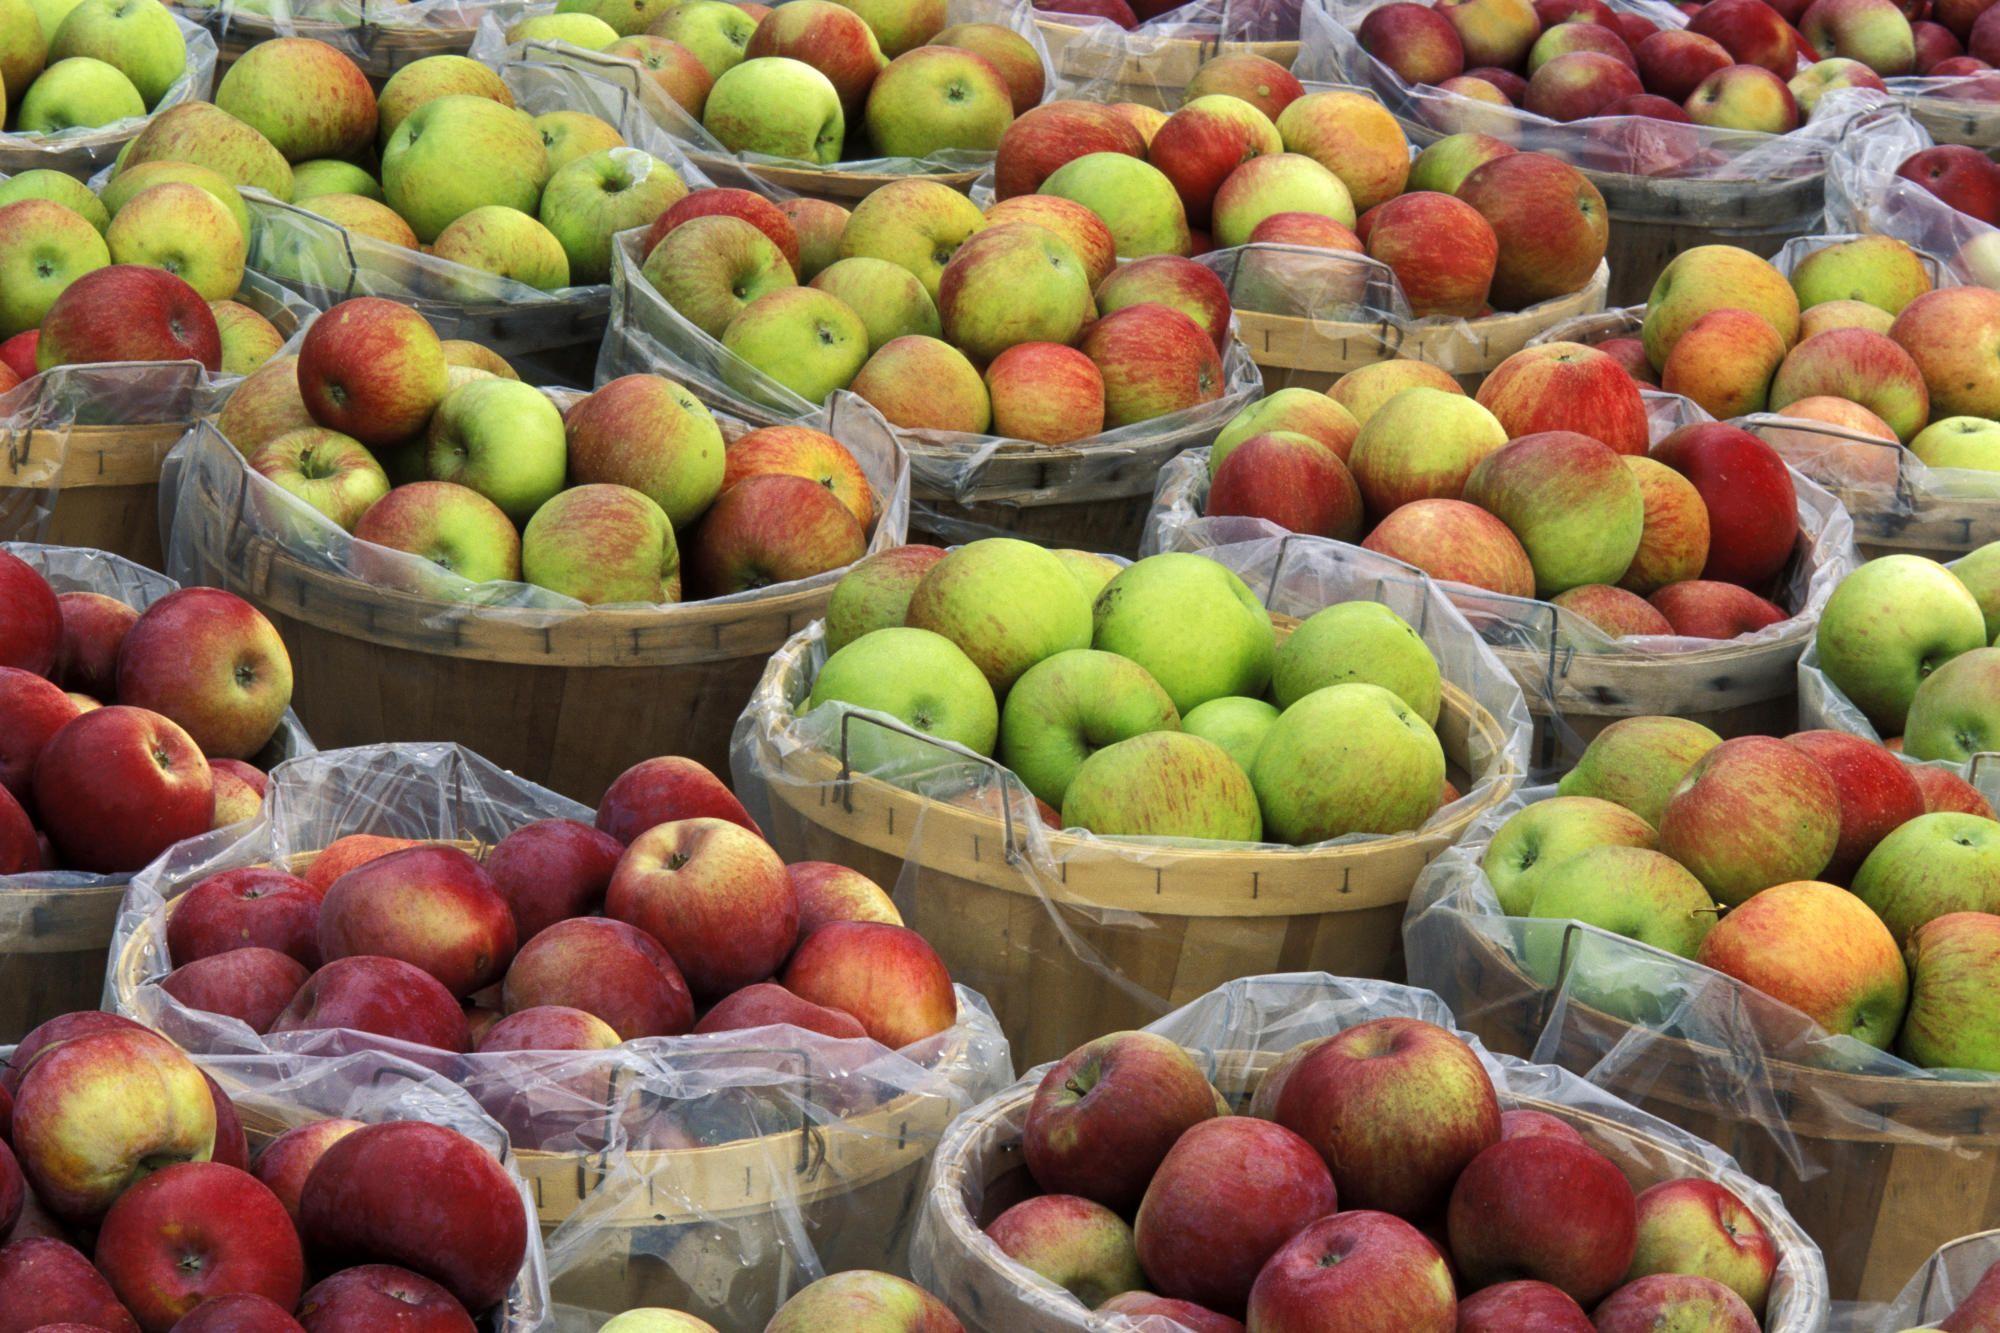 Macintosh apples in bushel baskets for sale, New York.